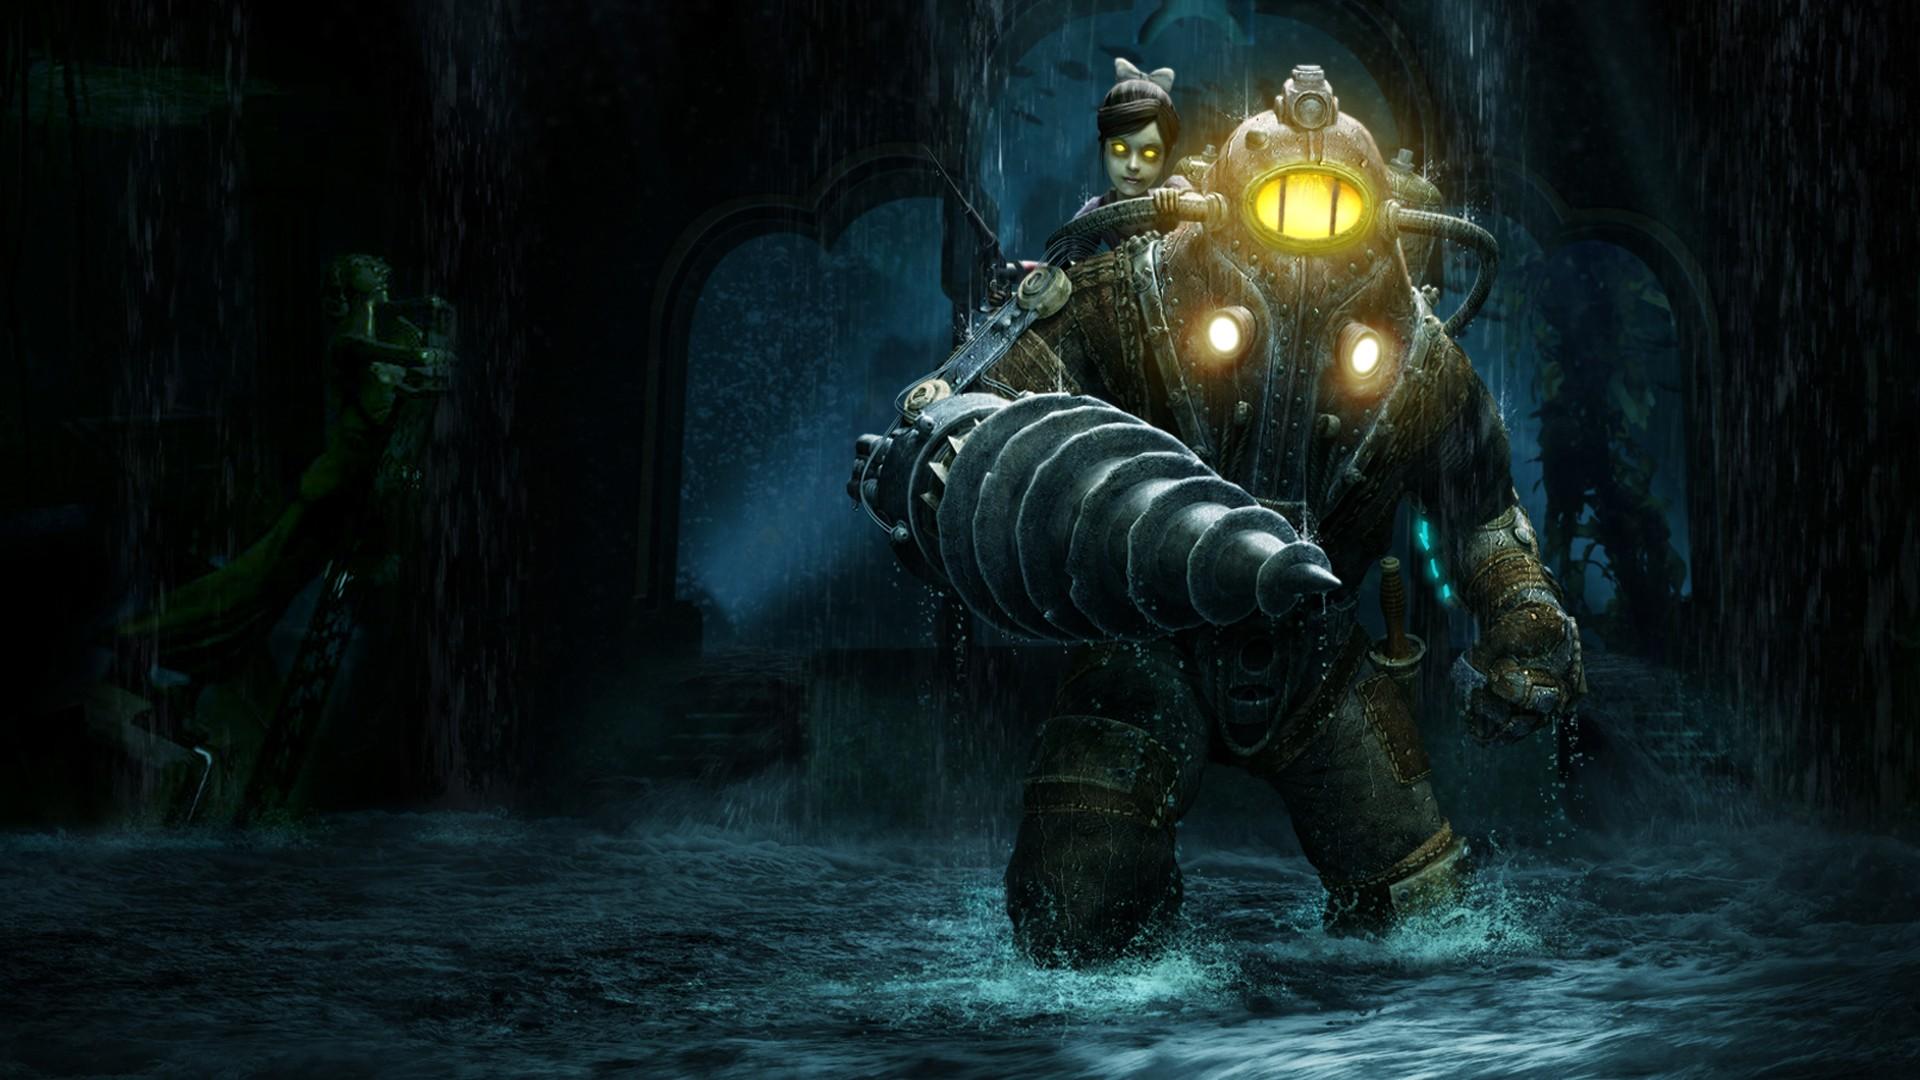 Little Sister Rapture Sea Big Daddy Video Games BioShock 2